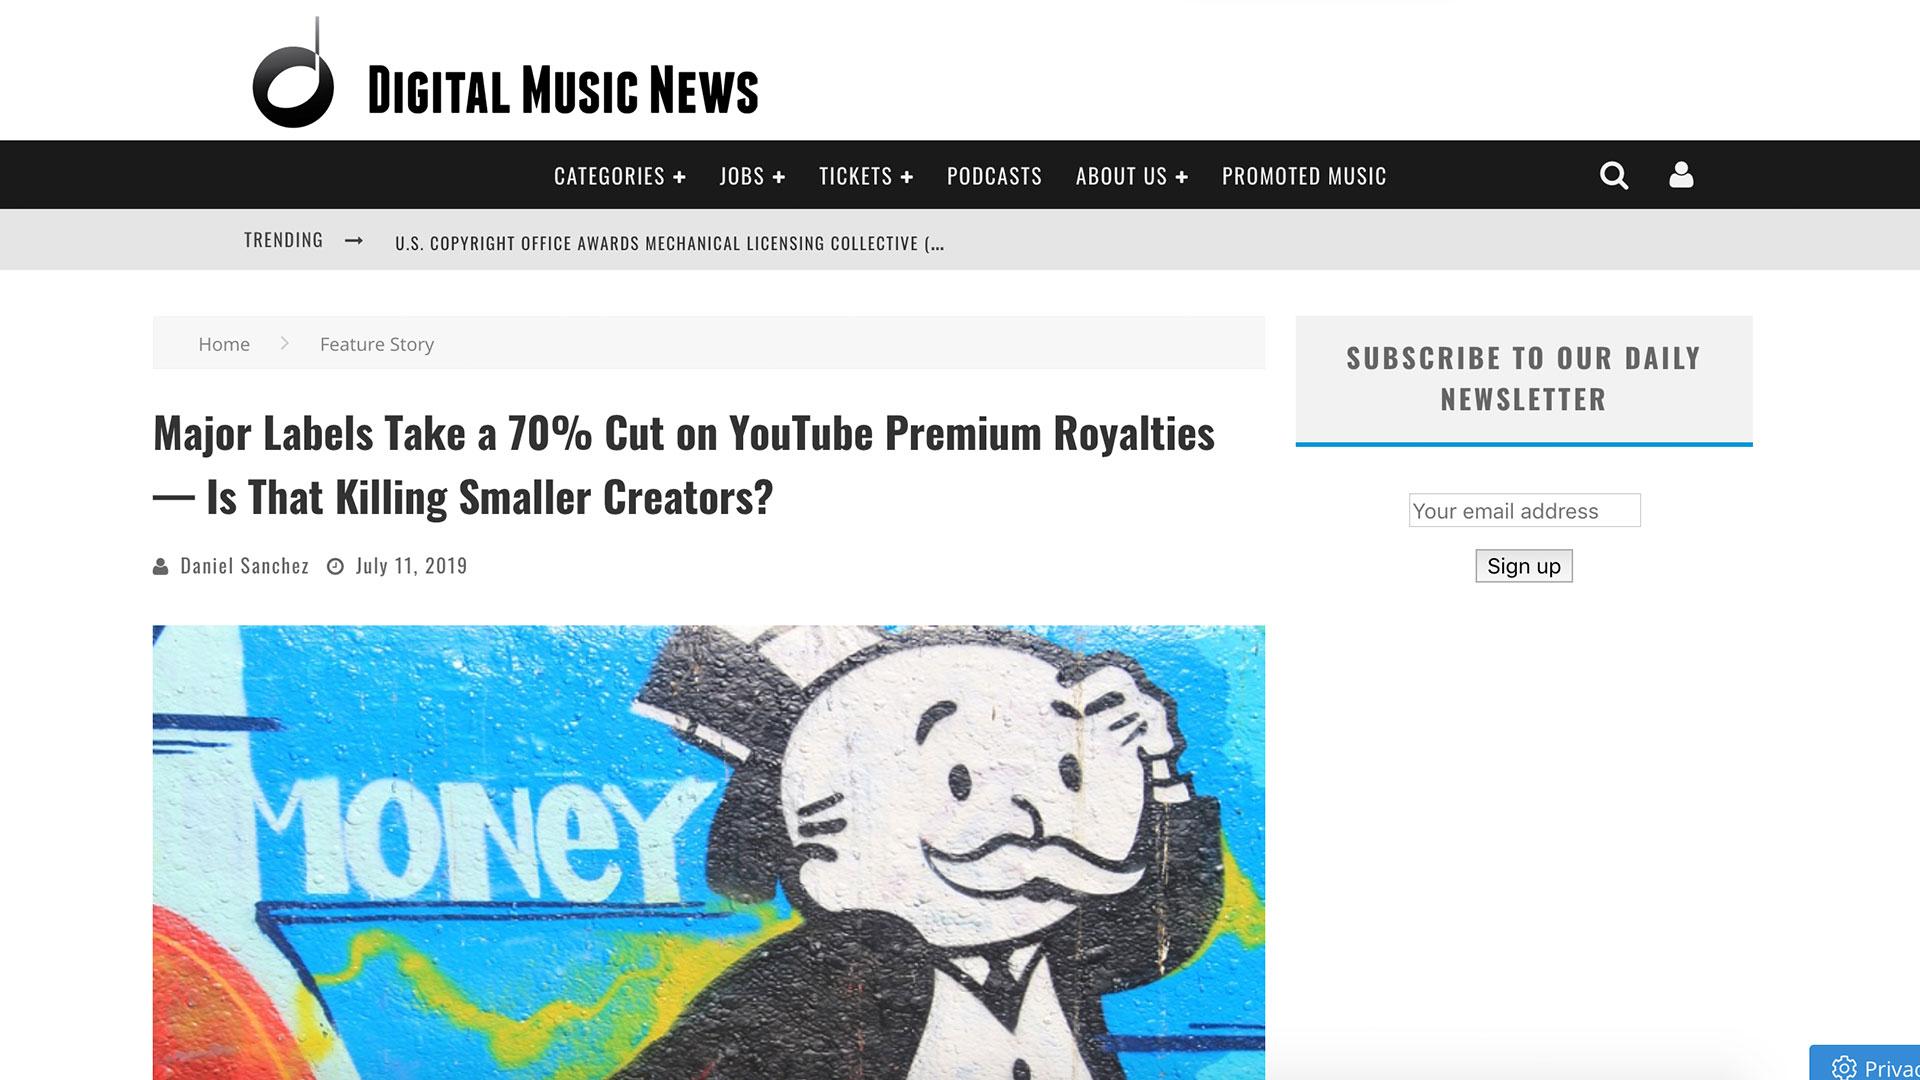 Fairness Rocks News Major Labels Take a 70% Cut on YouTube Premium Royalties — Is That Killing Smaller Creators?